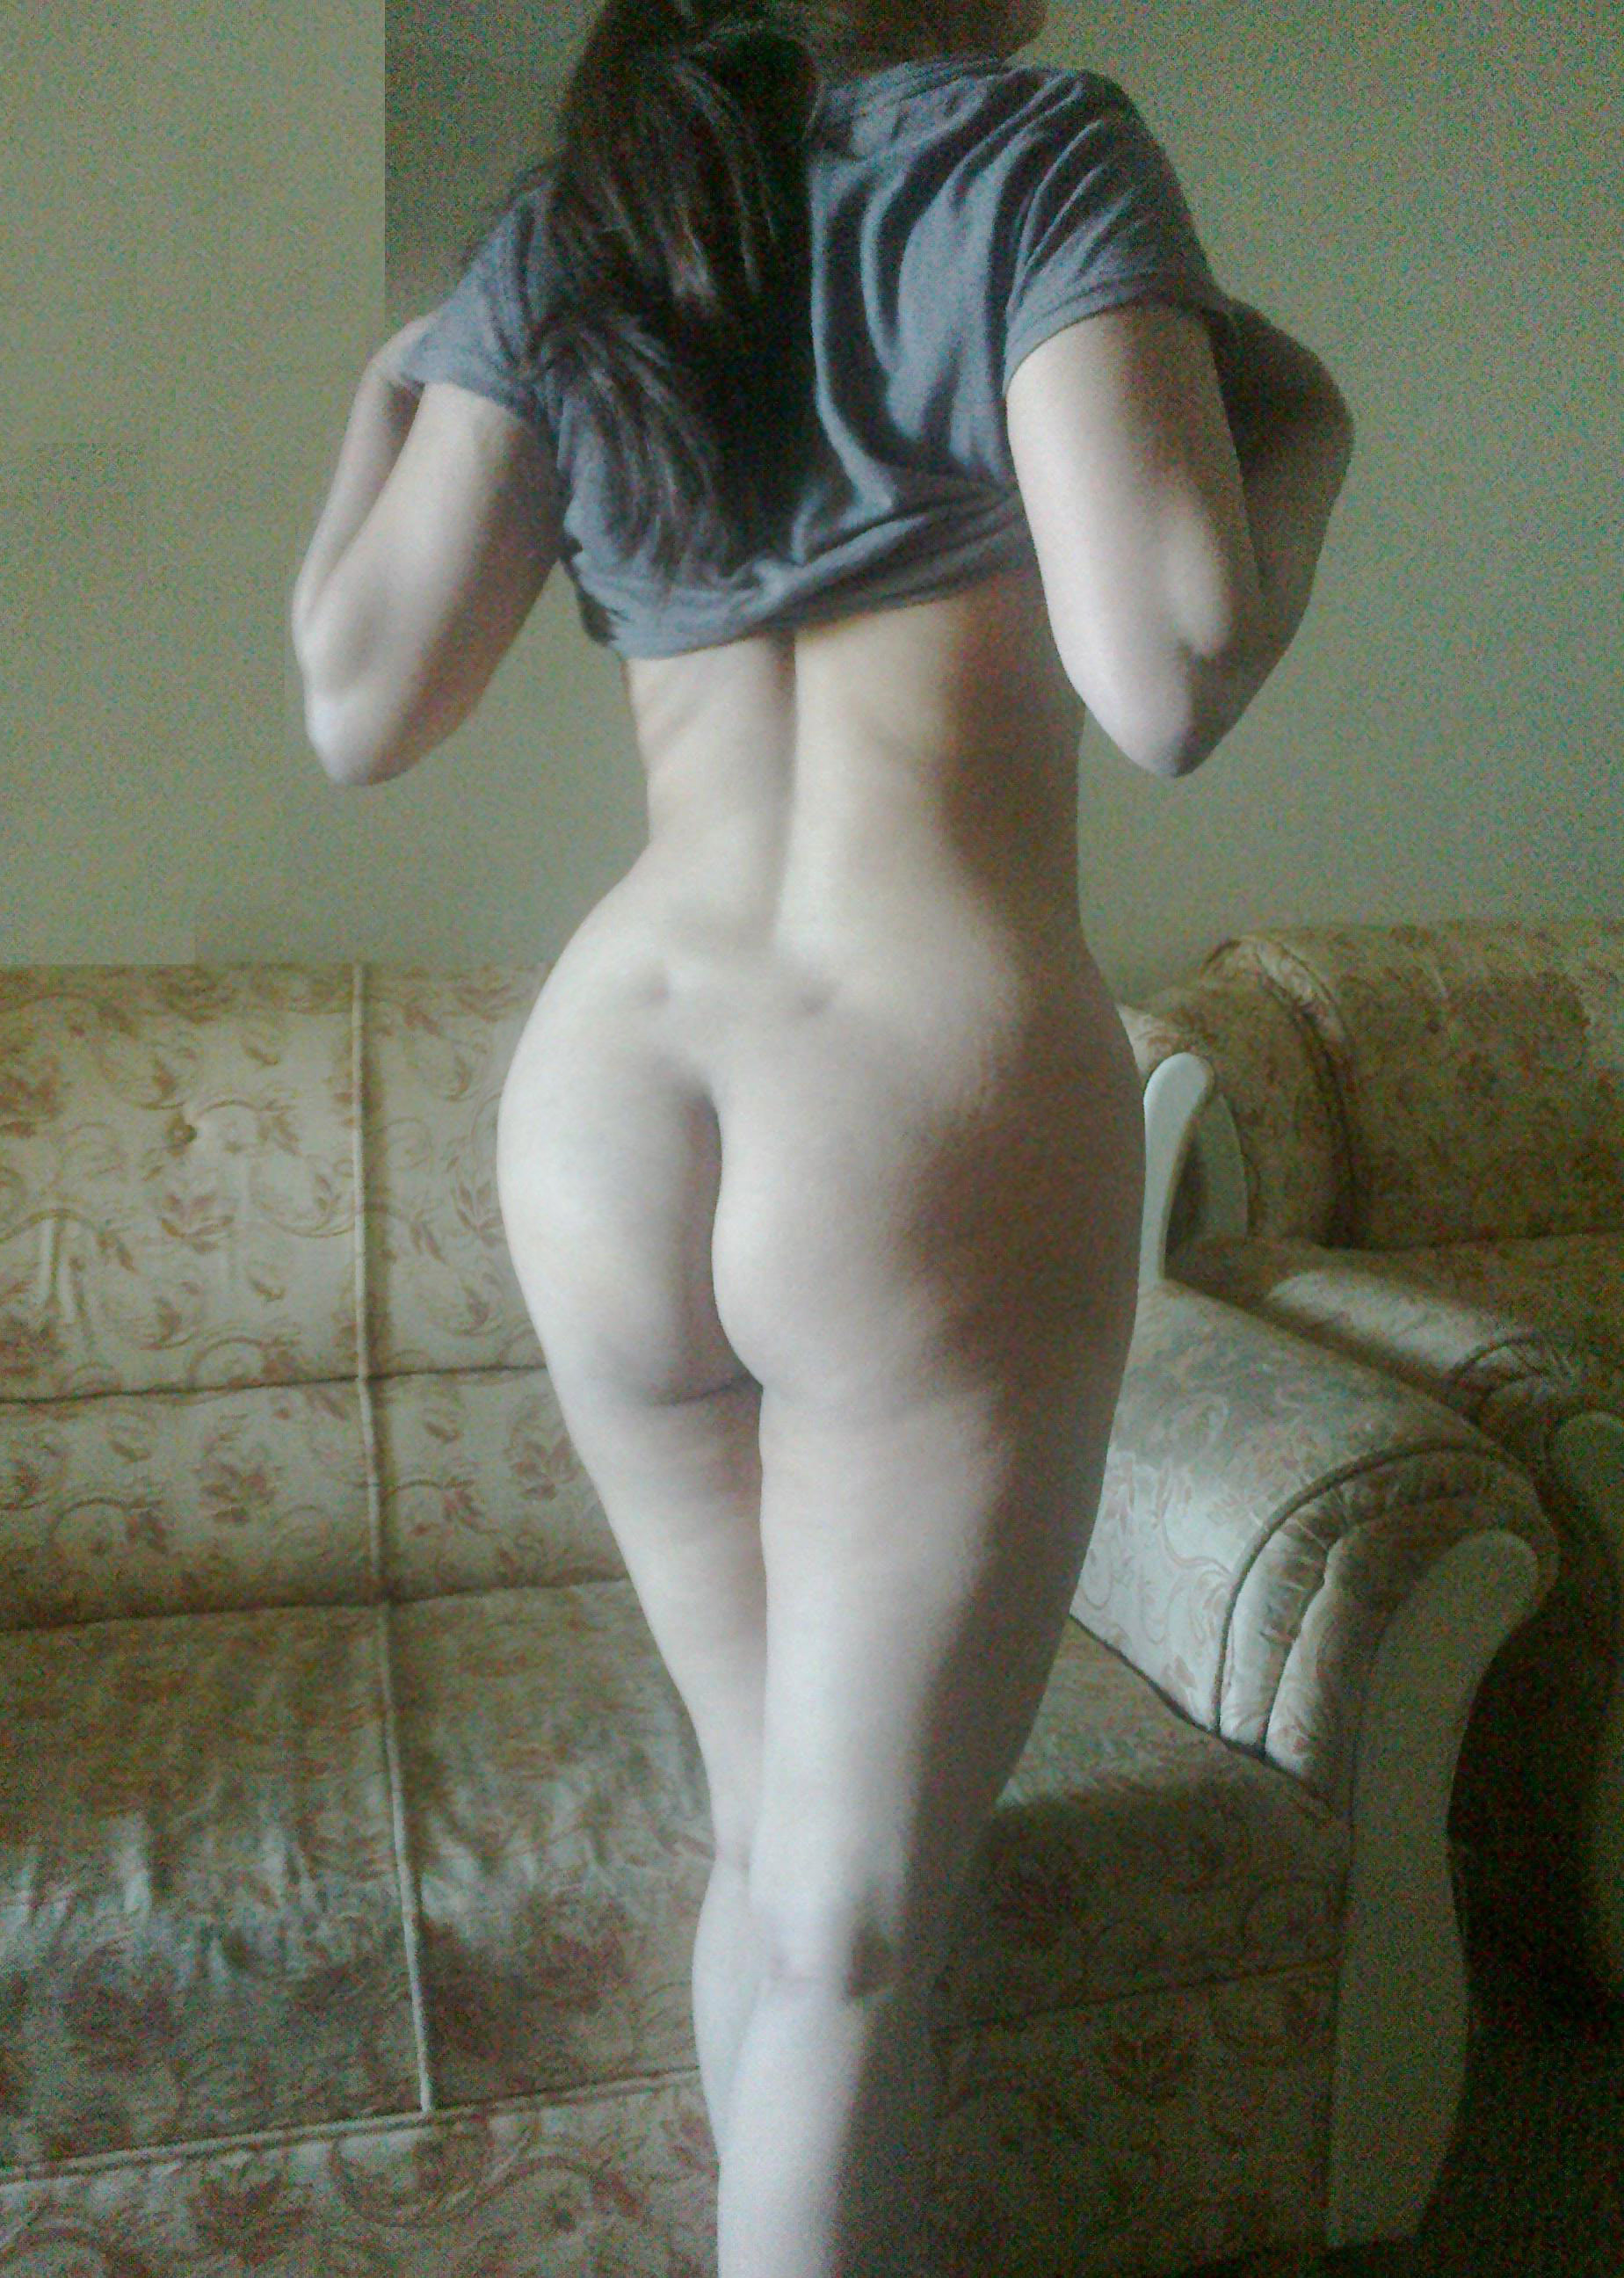 punjabi fat nude women